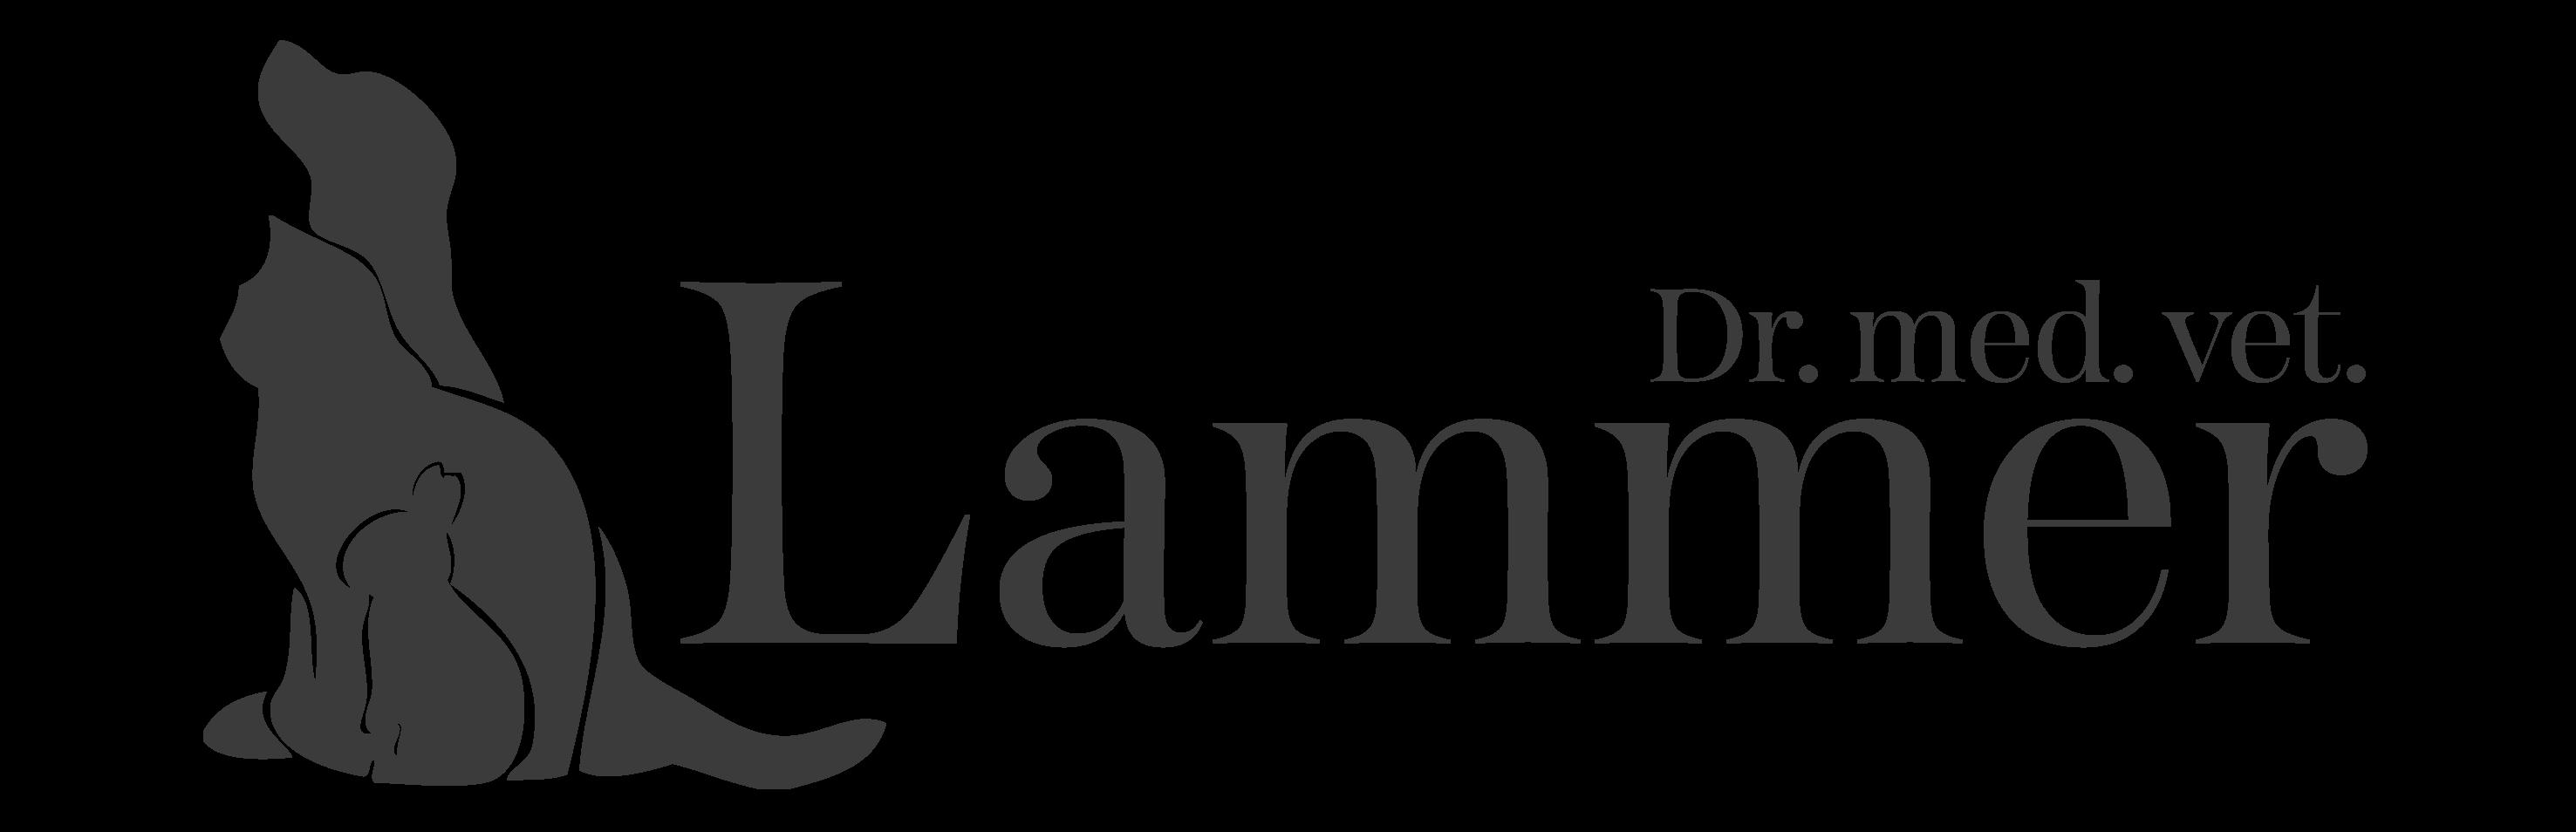 cropped-Logo-Lammer-grau-1.png